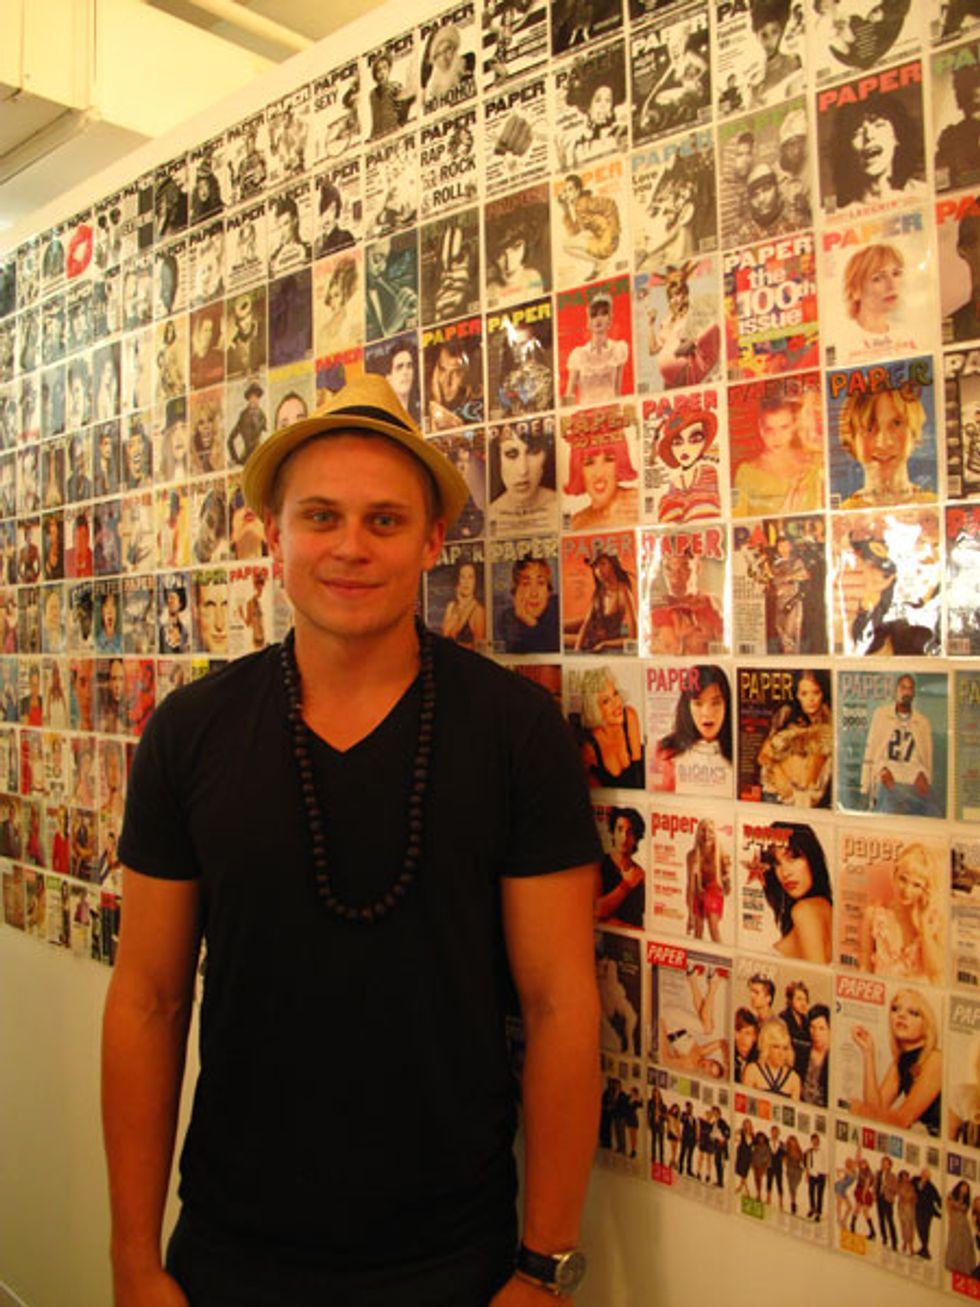 Meet-n-Greet With Actor-Musician Billy Magnussen